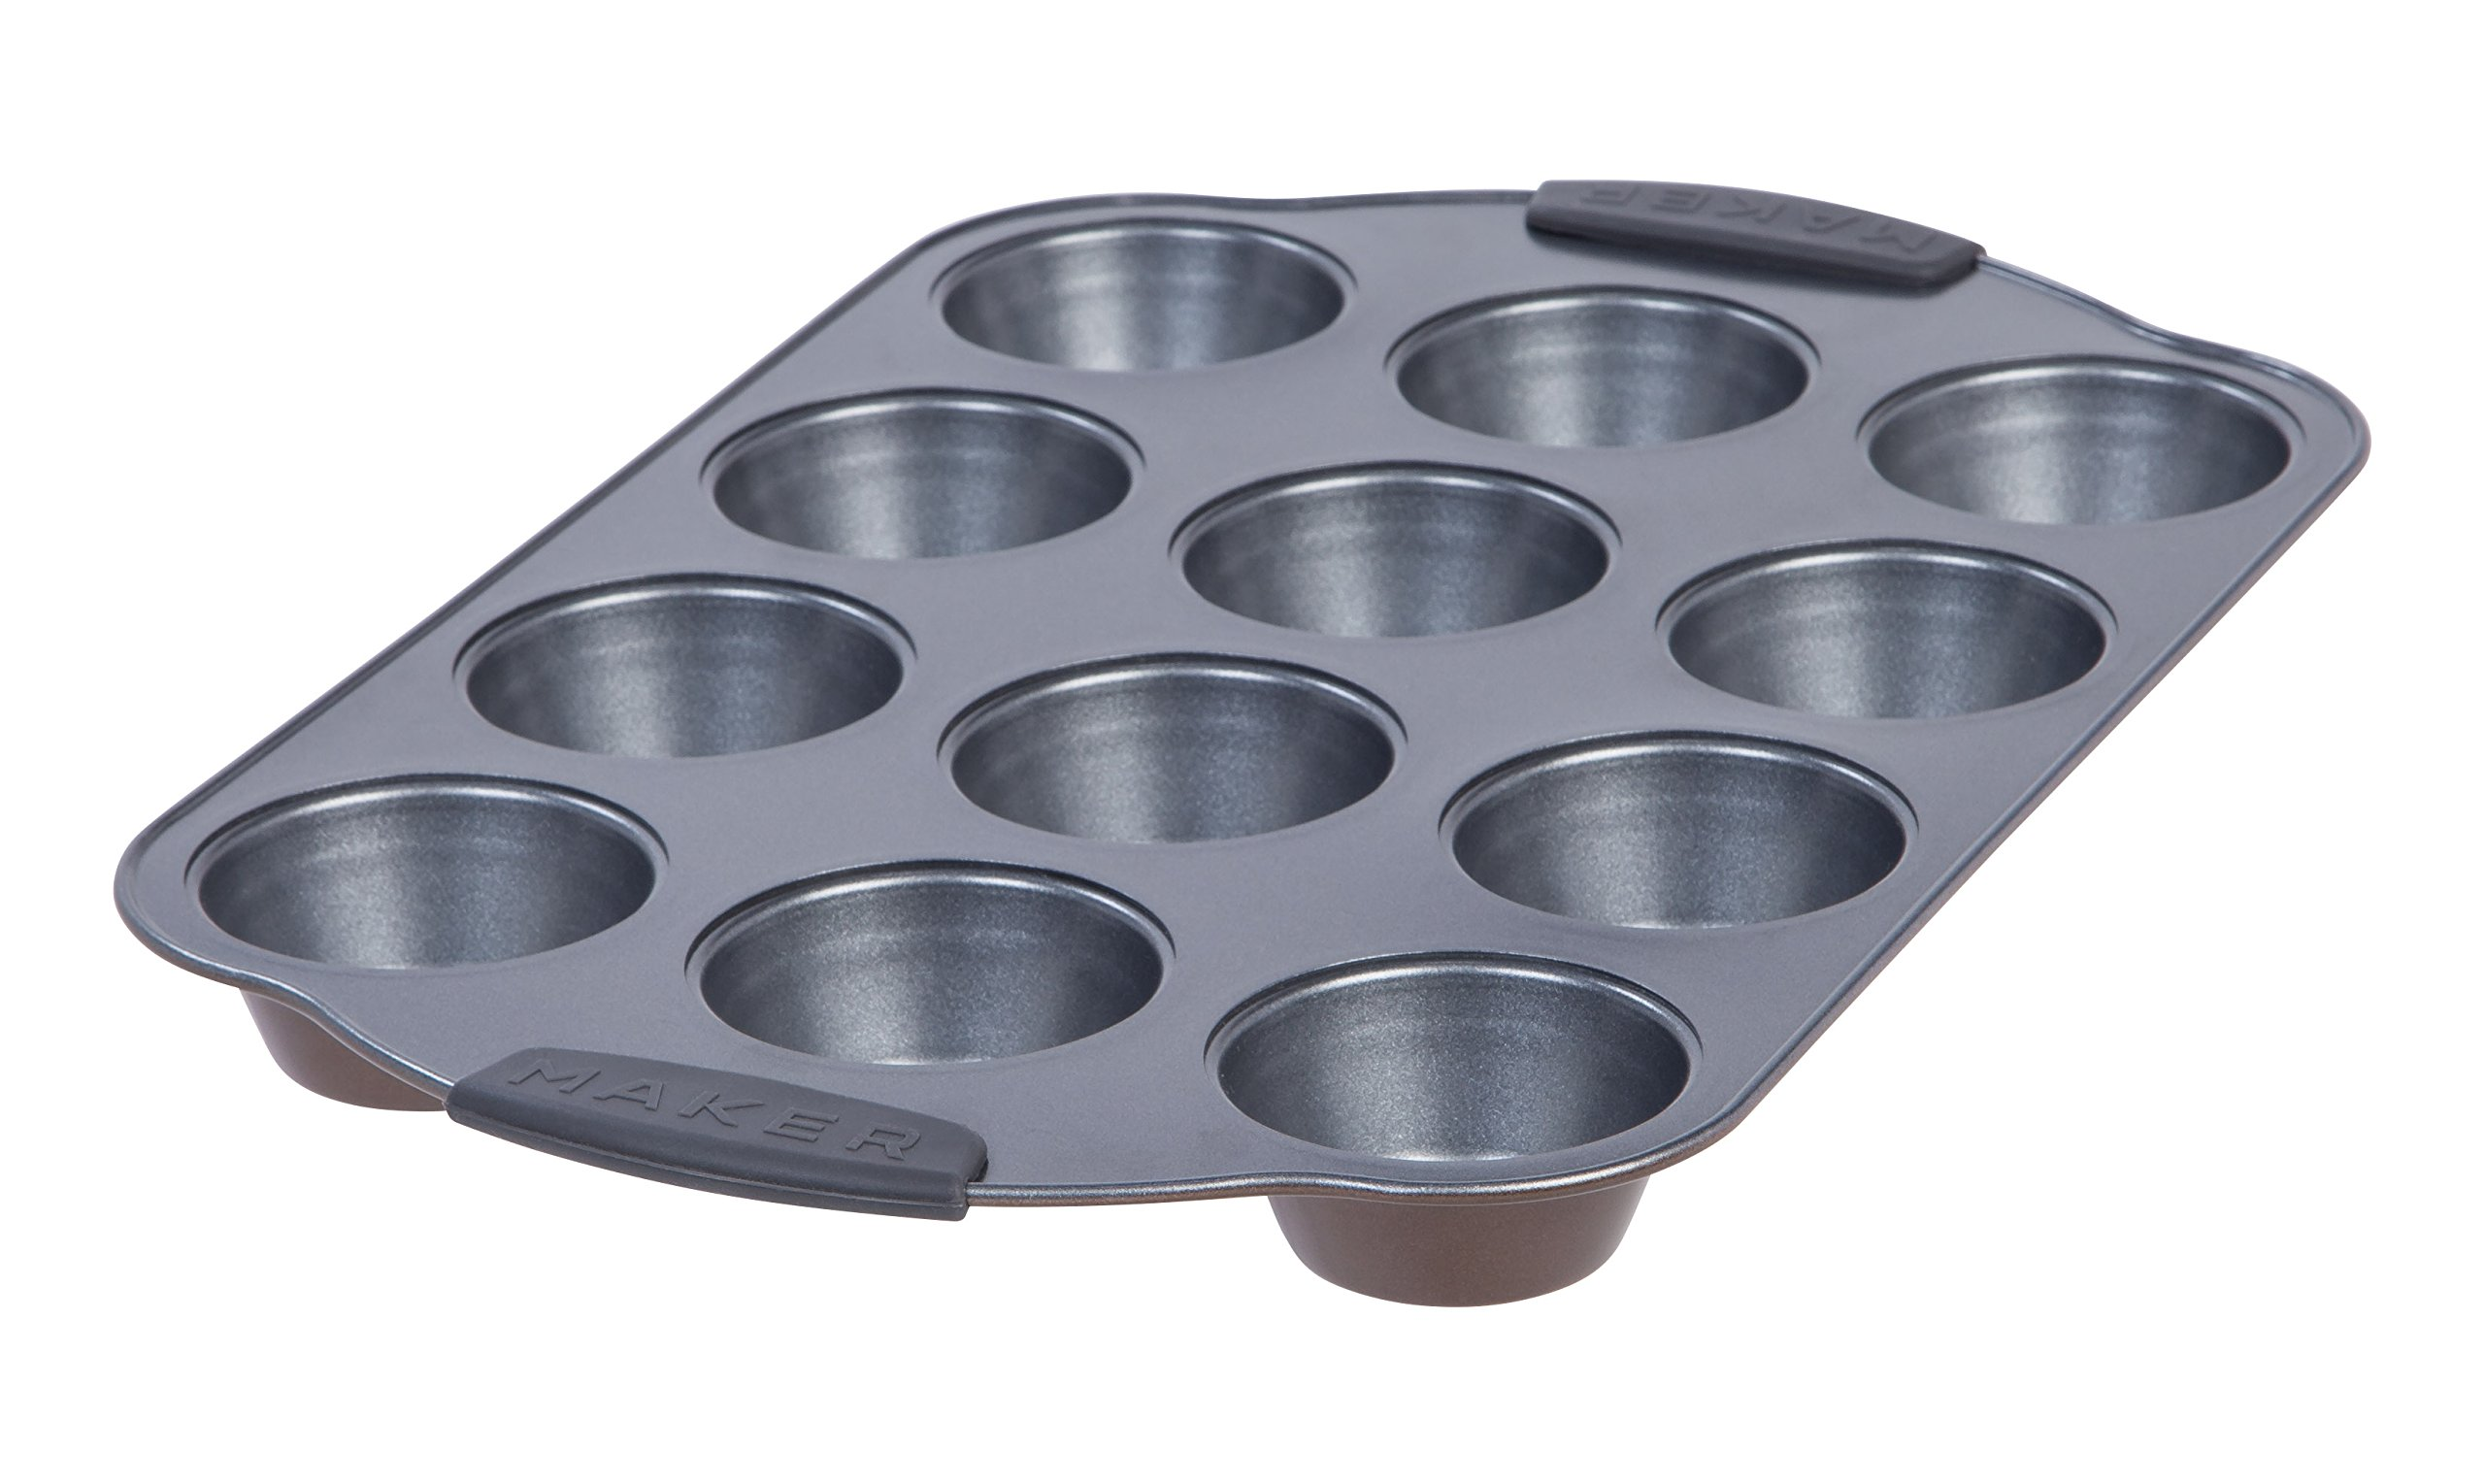 MAKER Homeware 12 Cup Standard Muffin Pan, 6 Pack